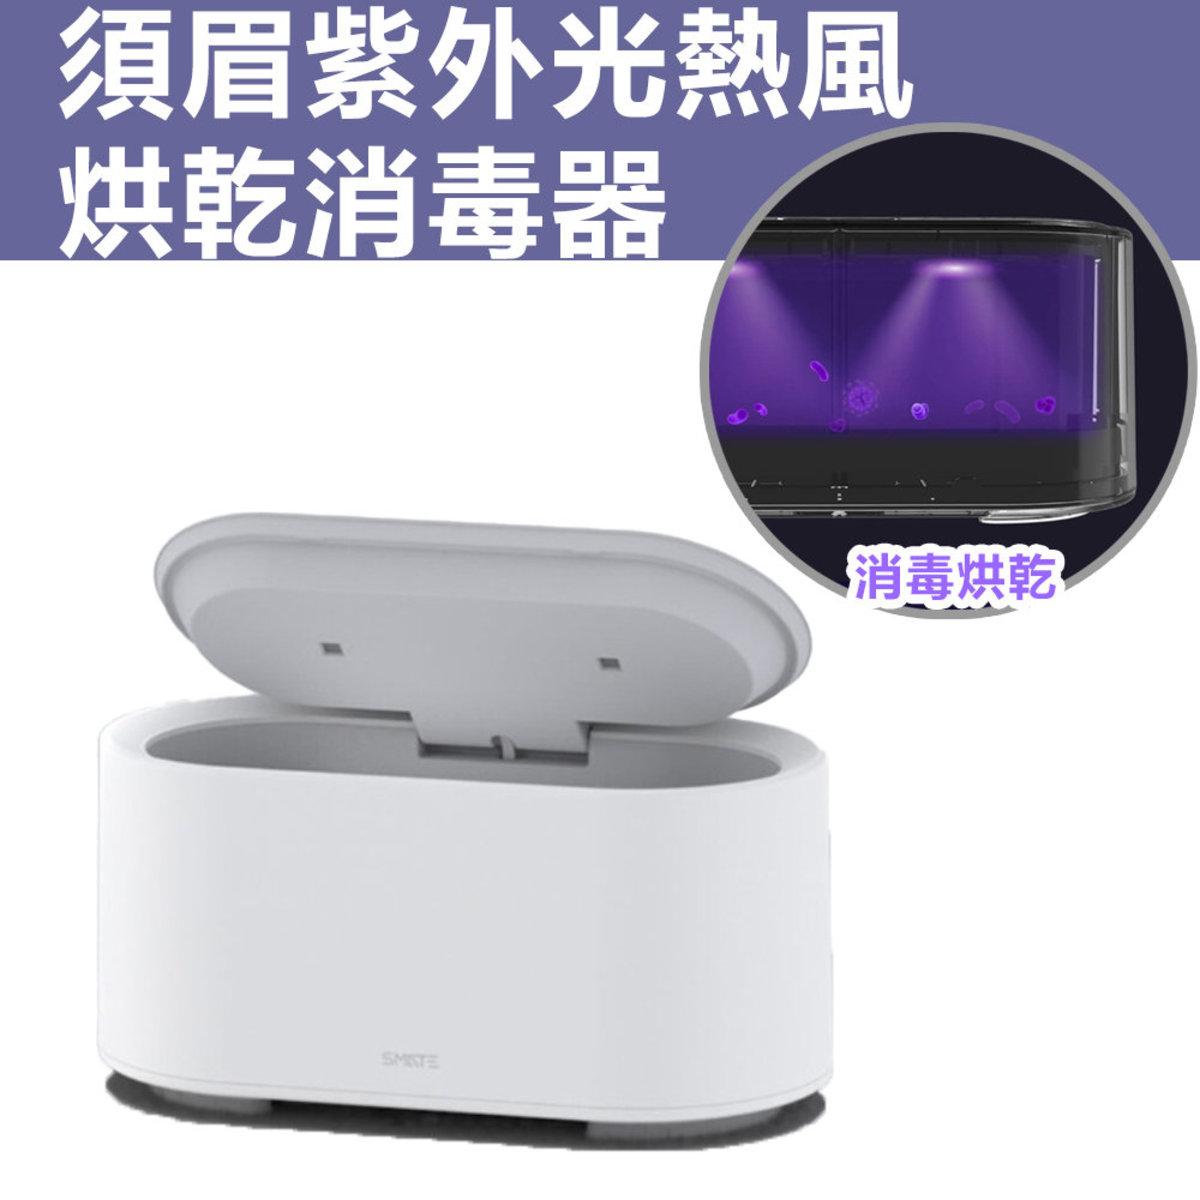 smzdm UV sanitizer Box SX-01